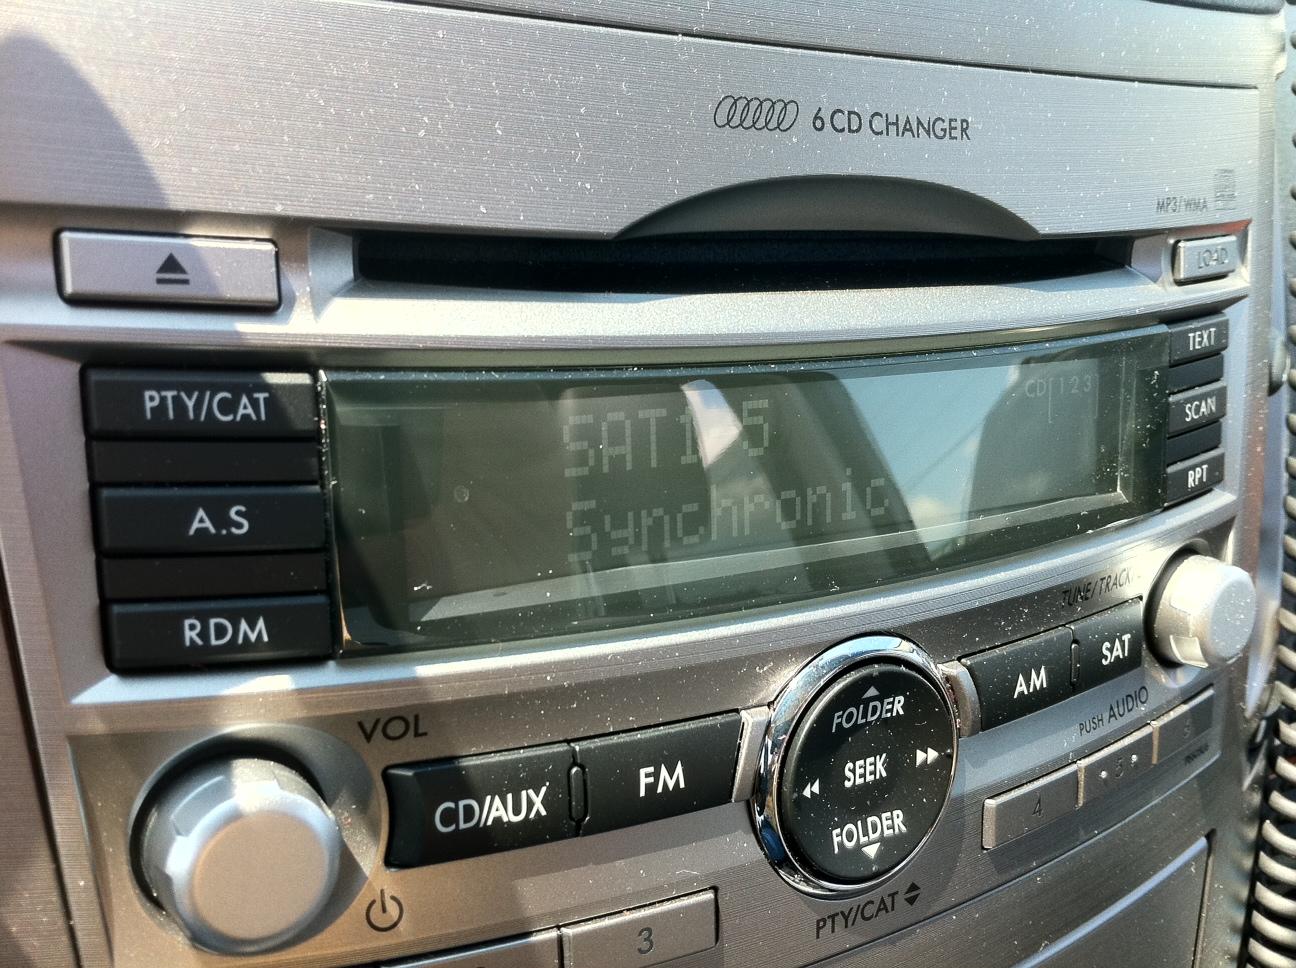 Hazy radio display?-photo.jpg